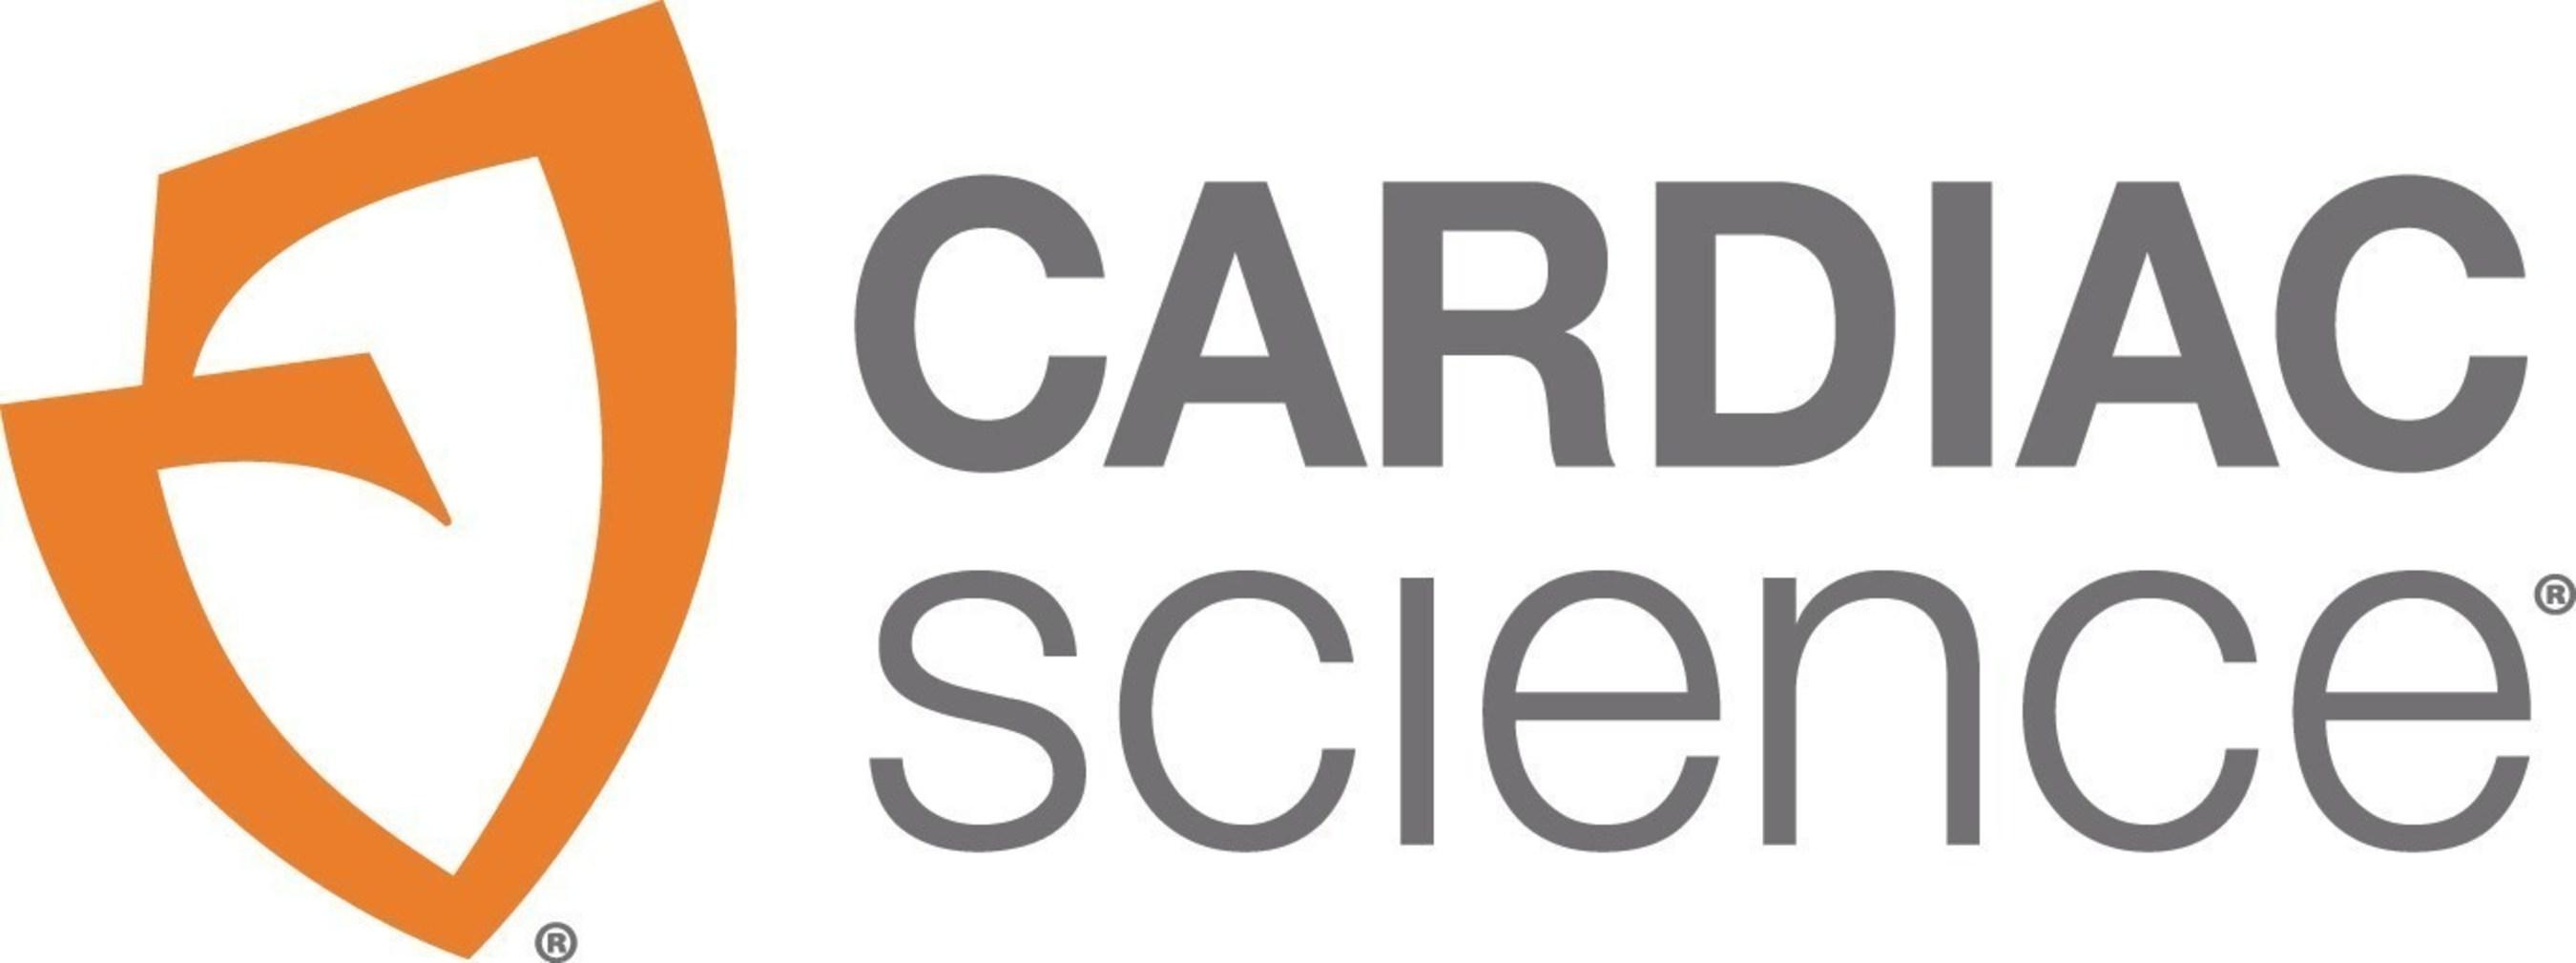 Cardiac Science Corporation is based in Waukesha, Wisconsin.